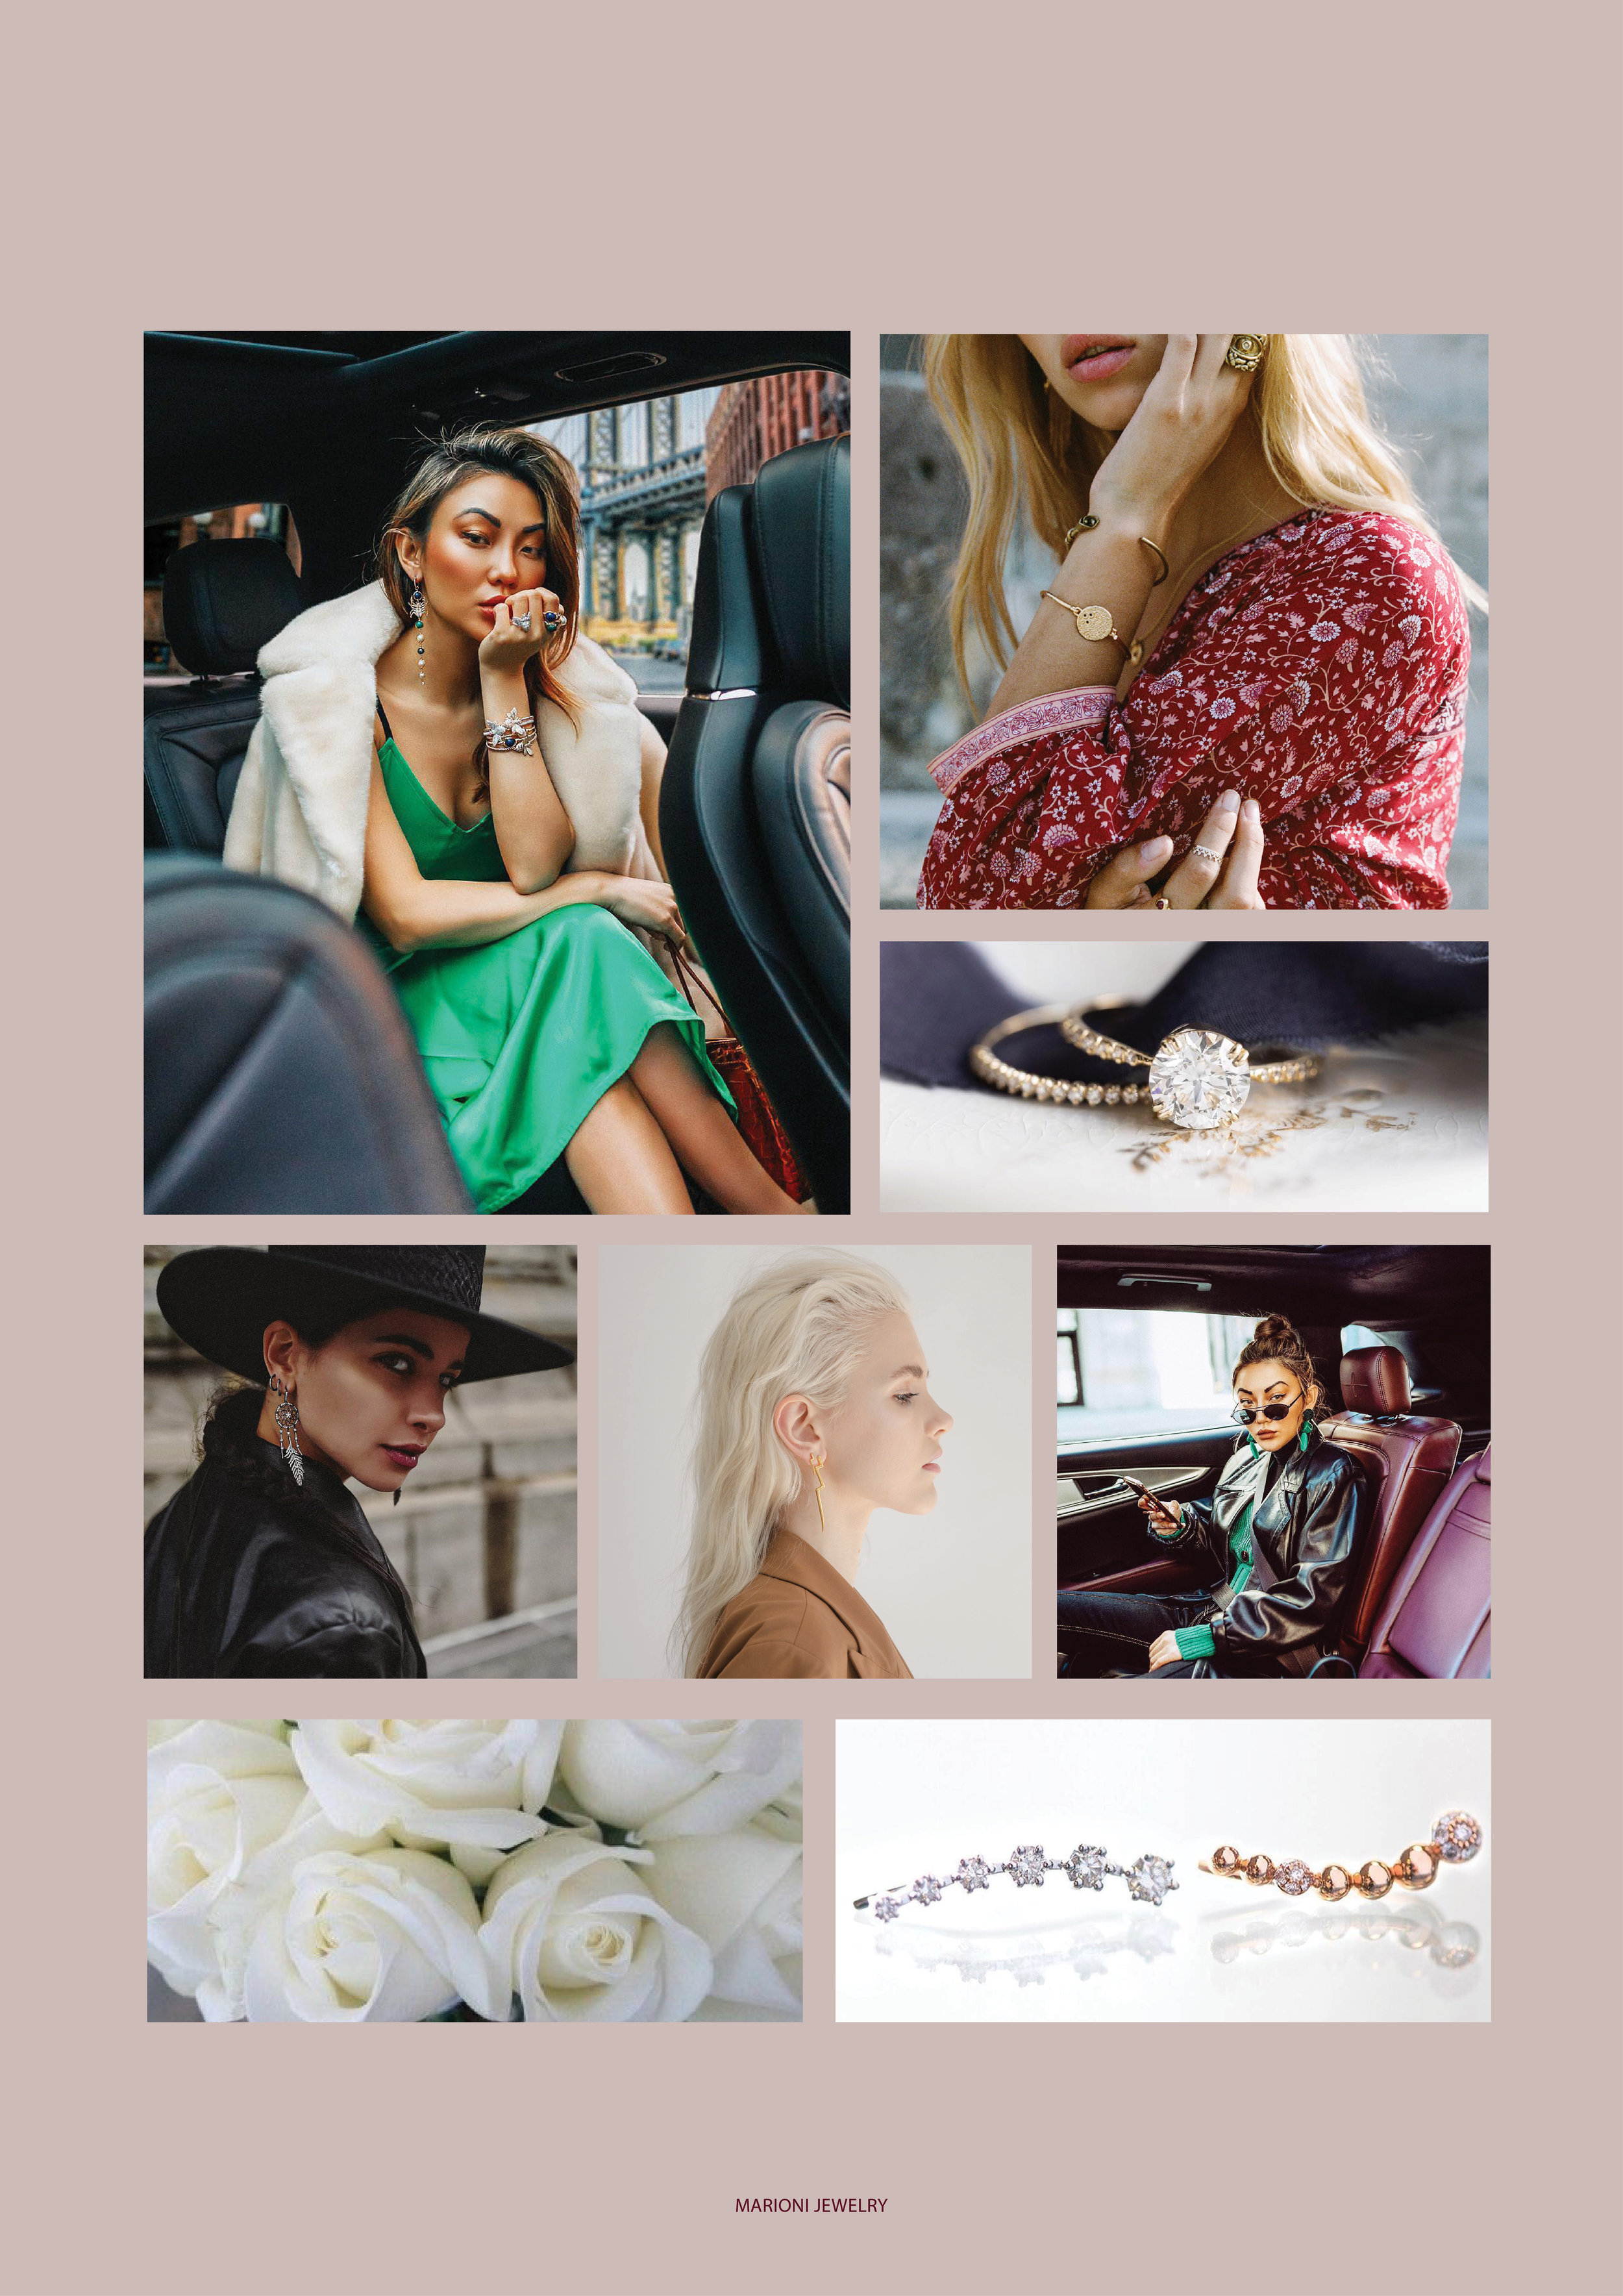 Marioni_Jewelry_Lookbook12.jpg